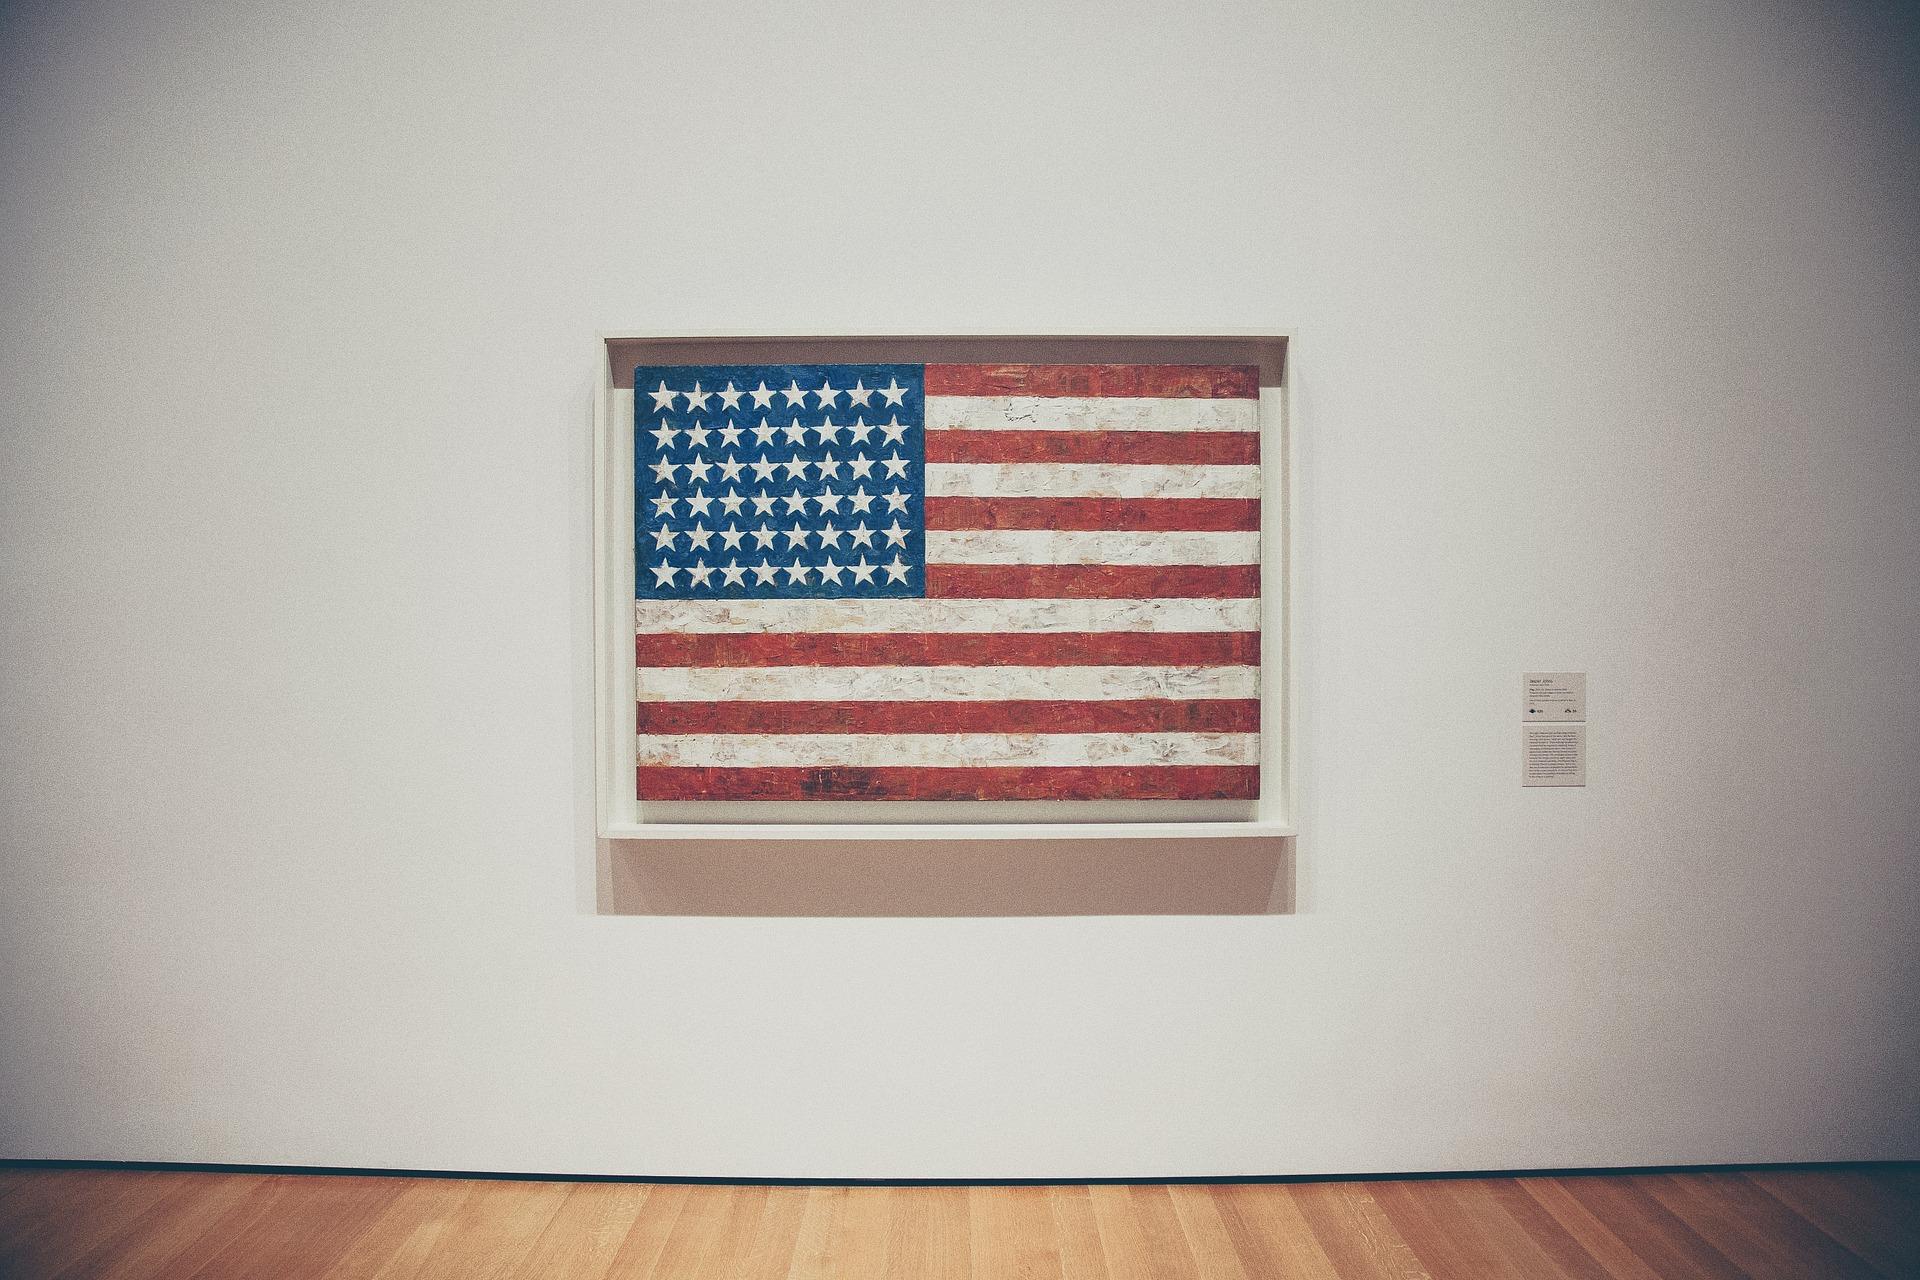 american-flag-802037_1920.jpg